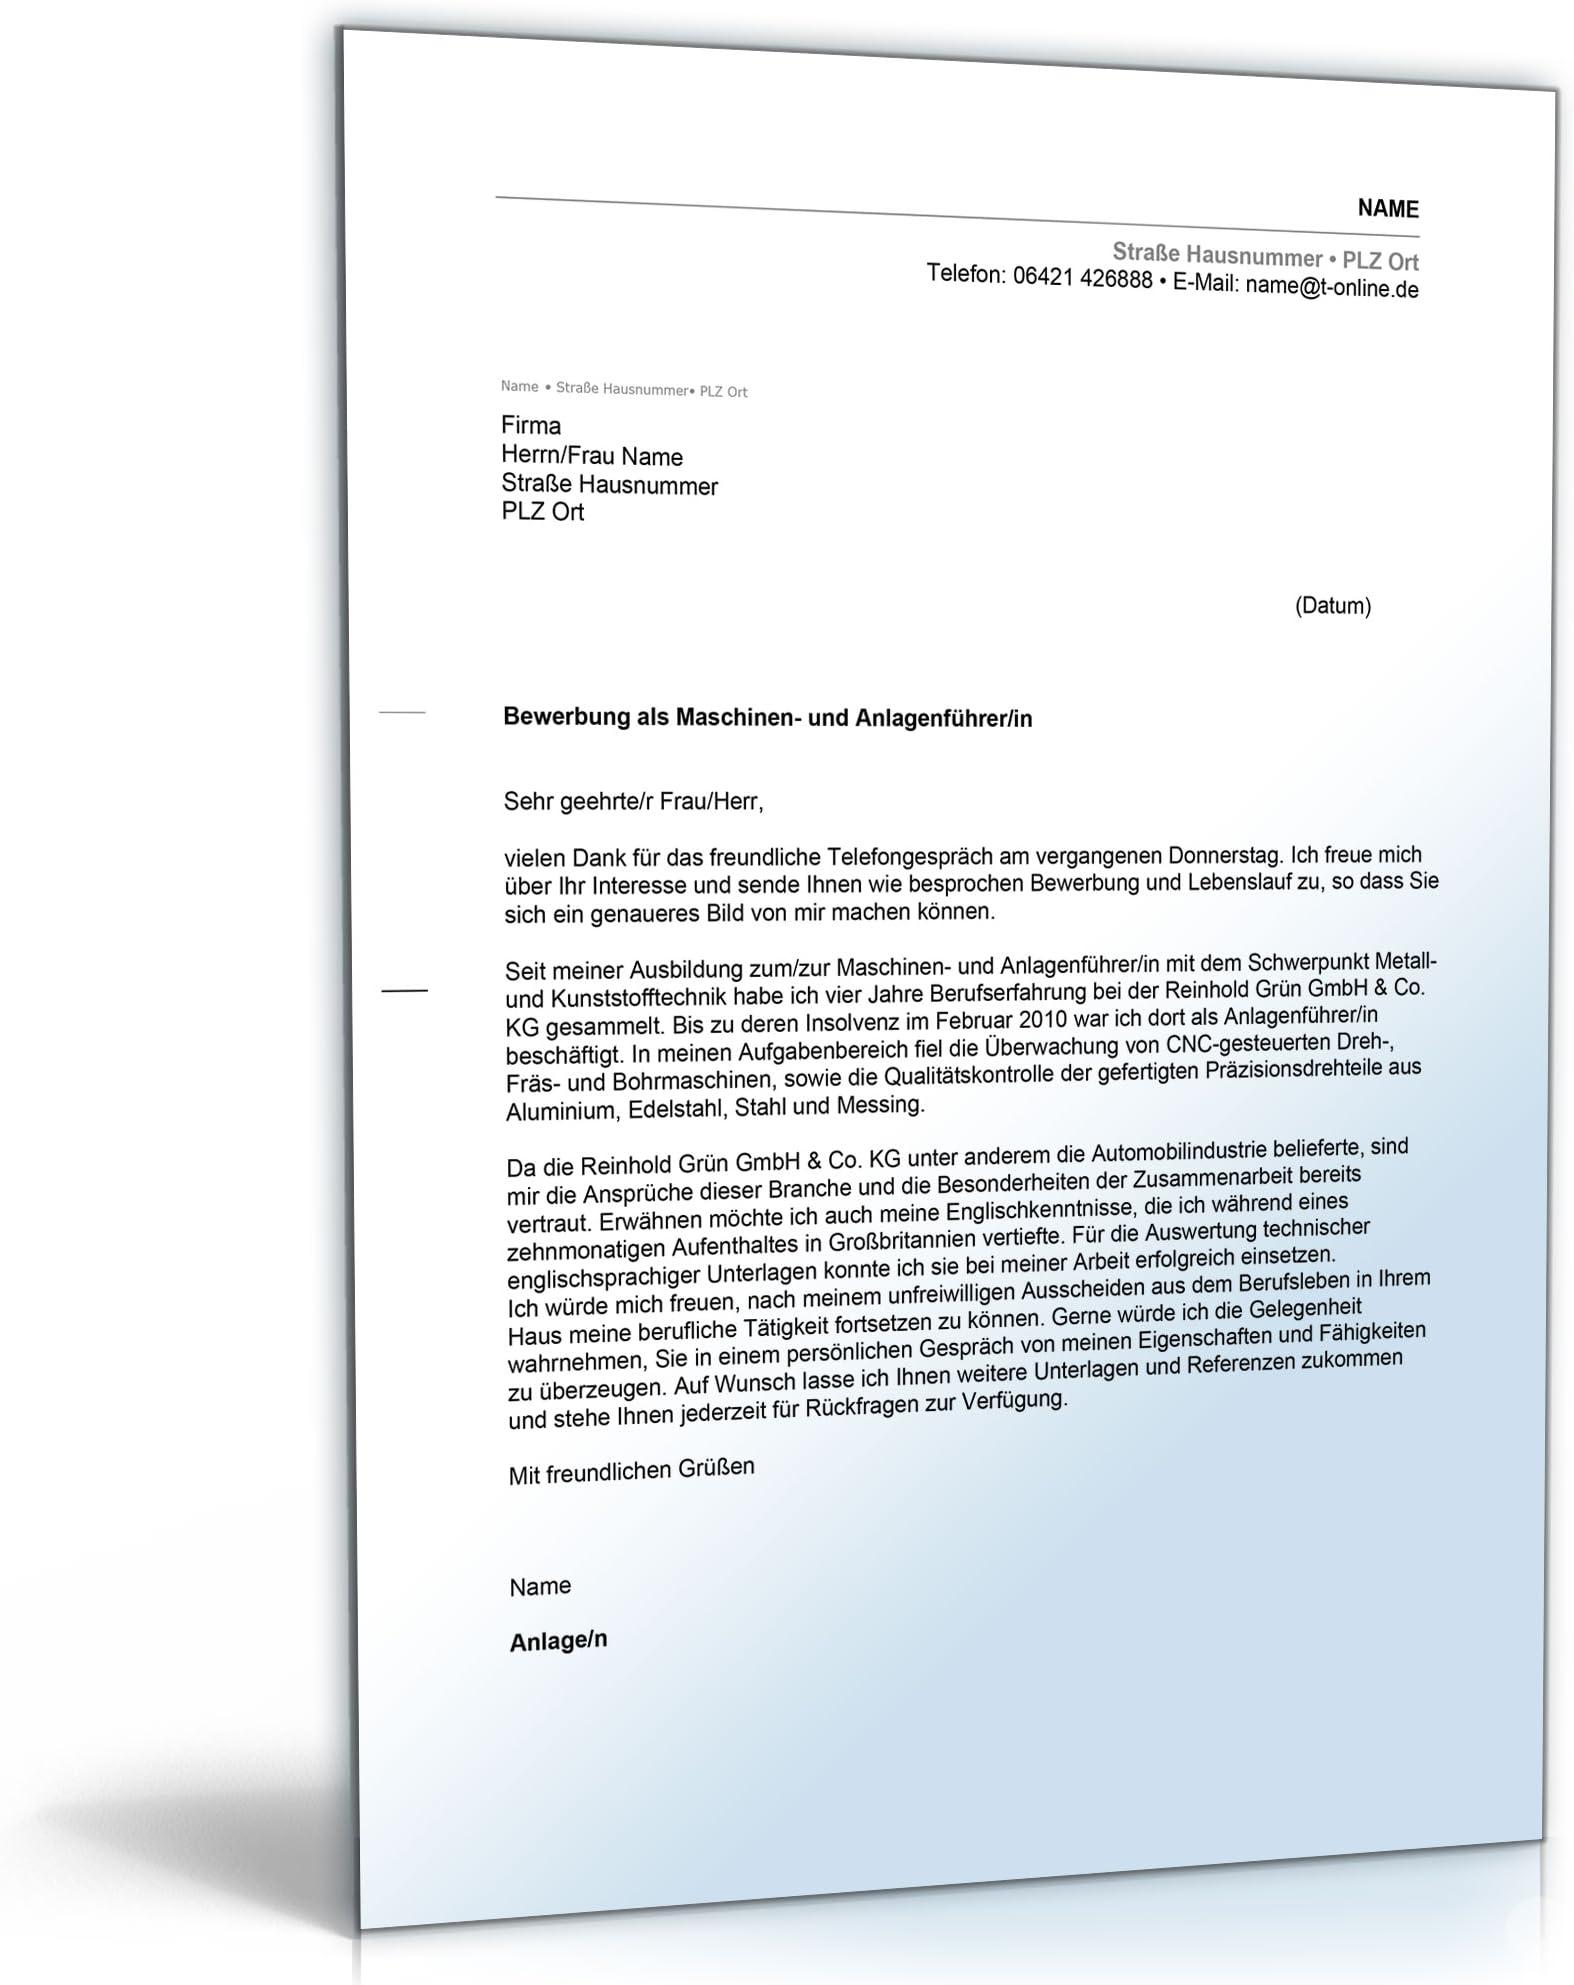 Application A Writing Office Kraft Application